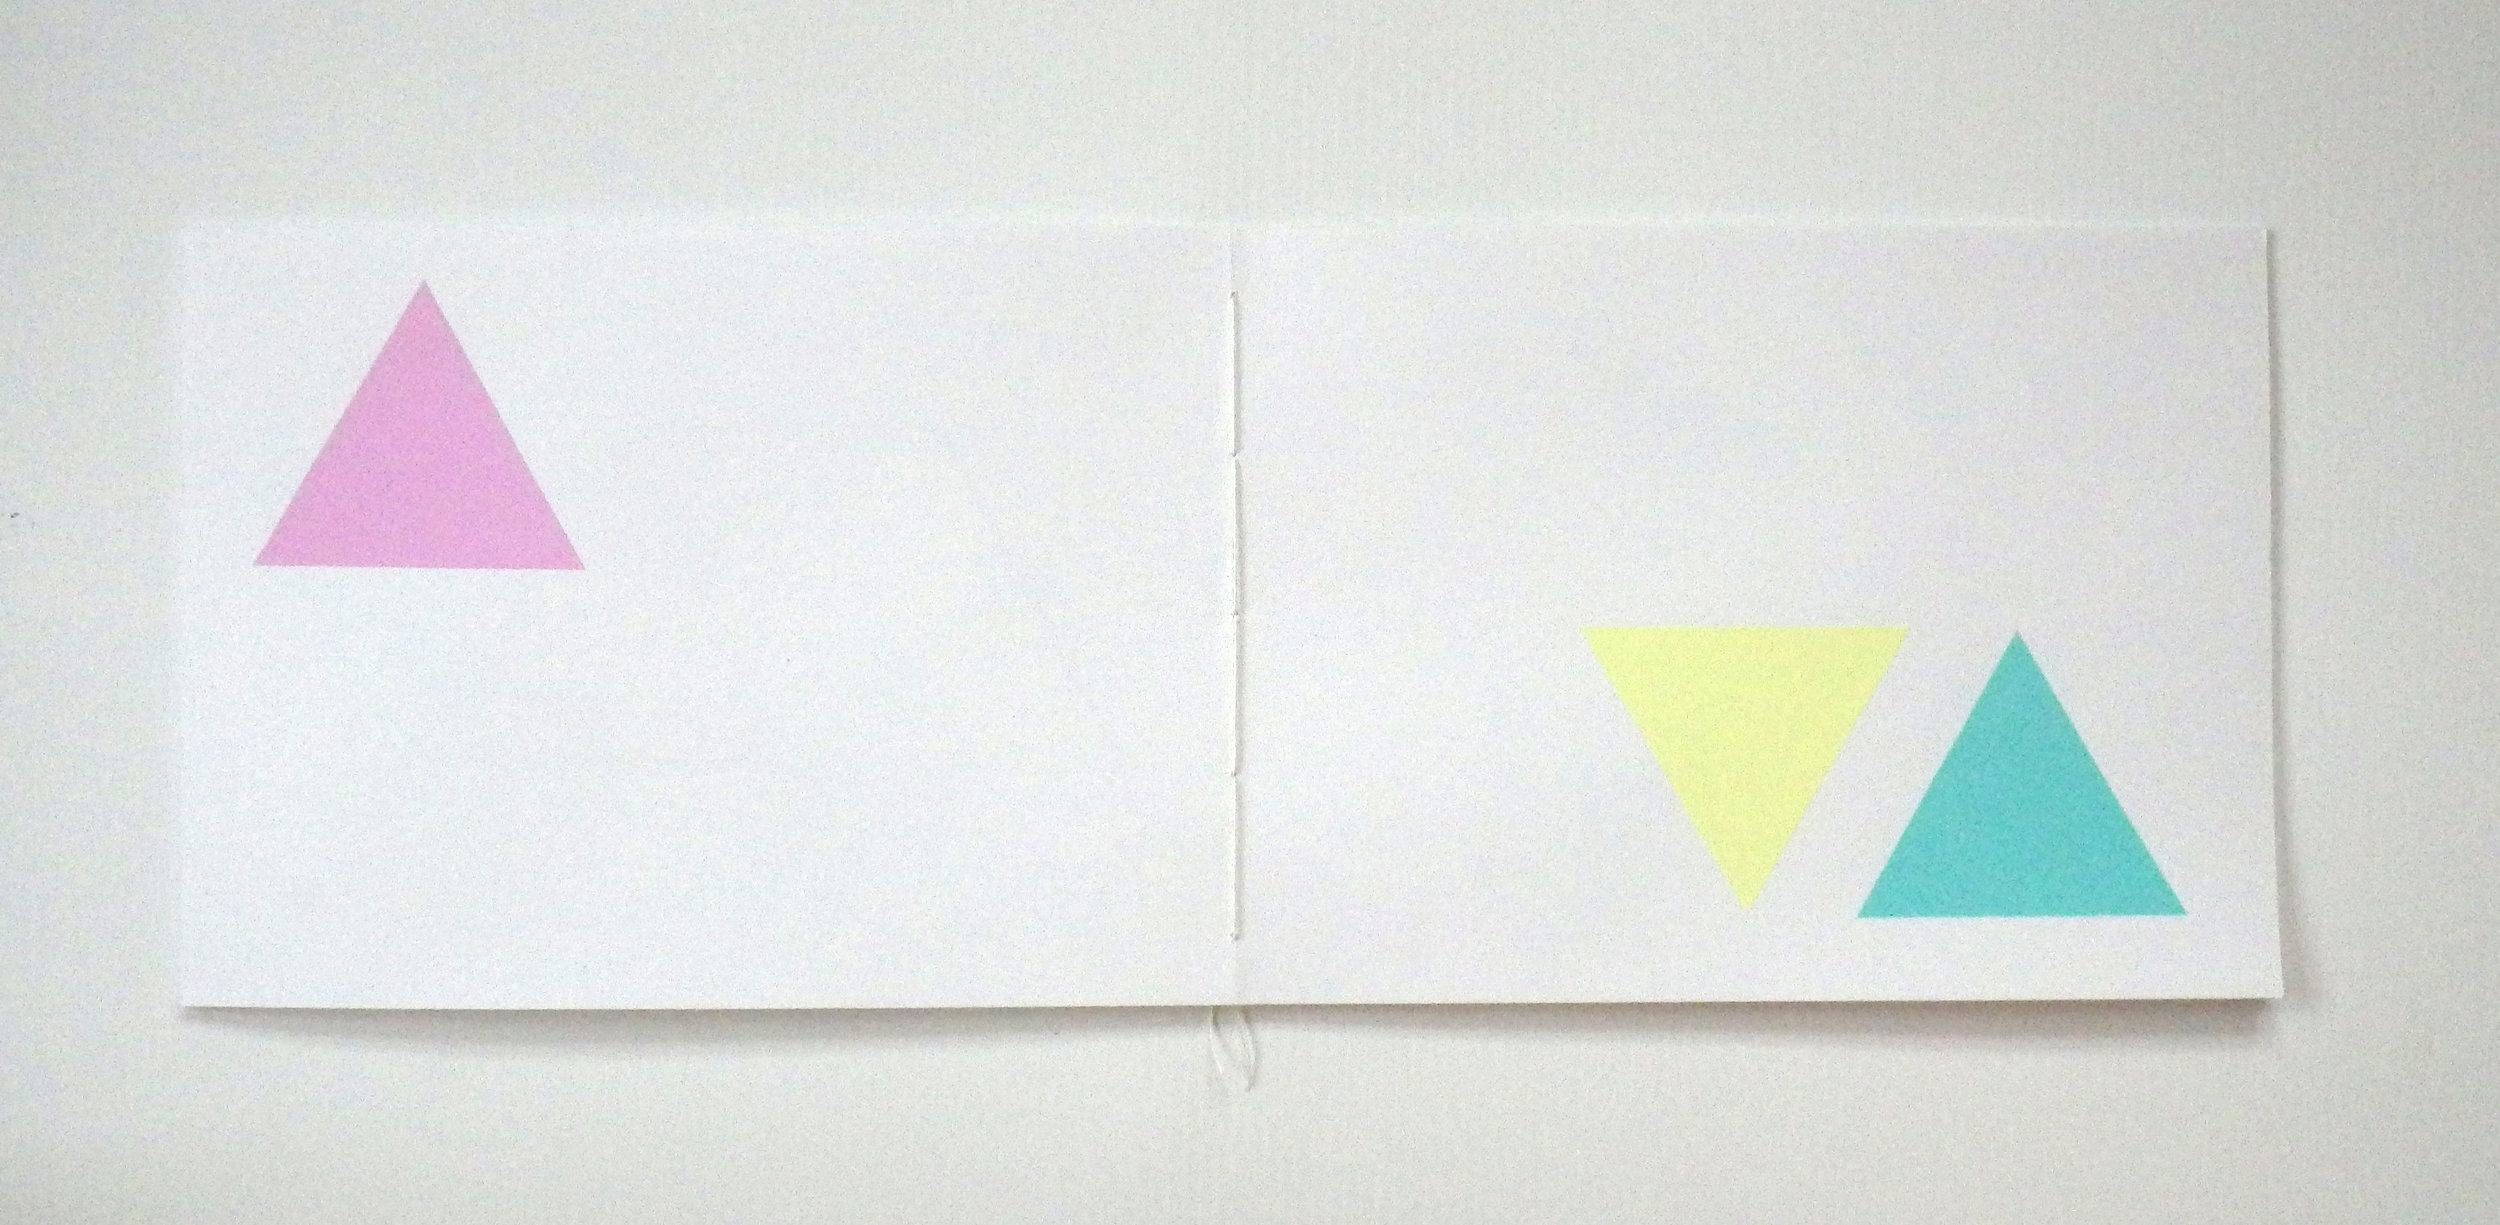 Rigid Motions of a Tetrahedron